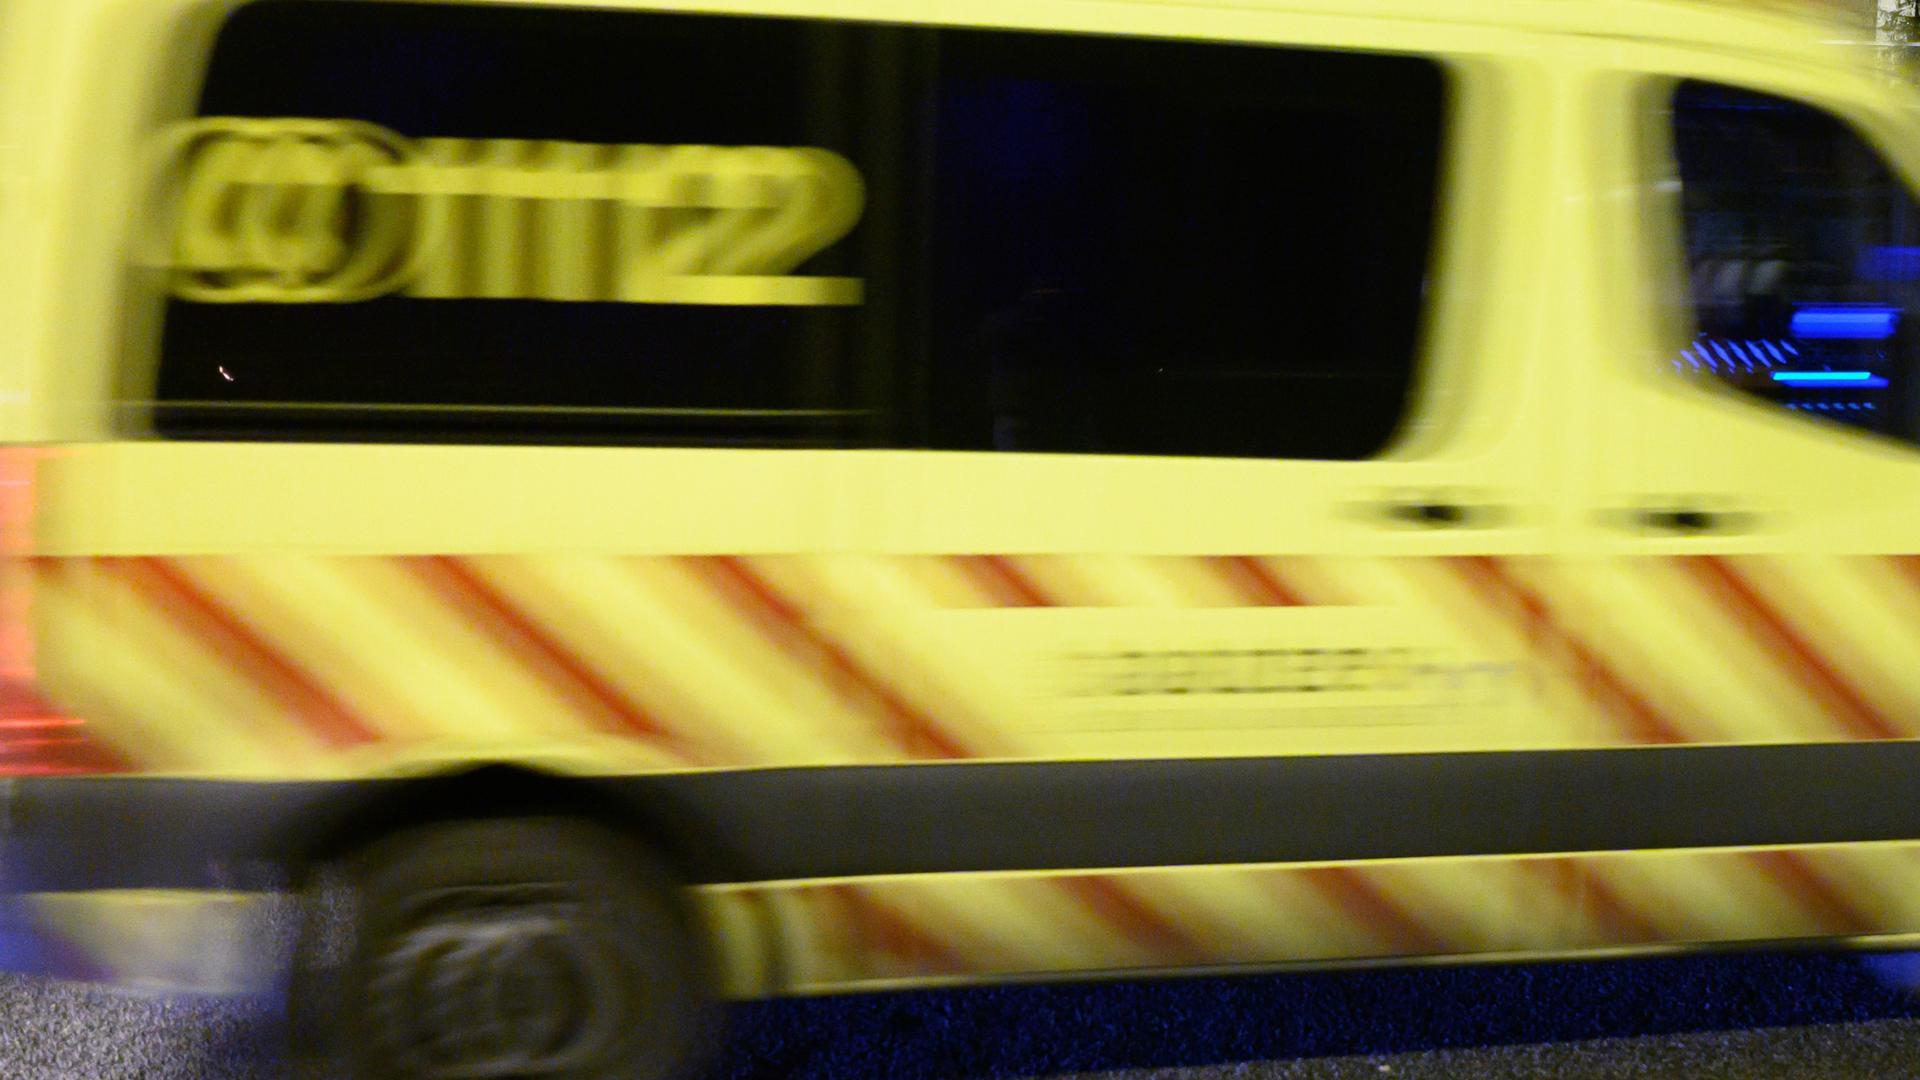 Rettungskräfte konnten den Fahrer nur noch tot bergen (Symbolbild).